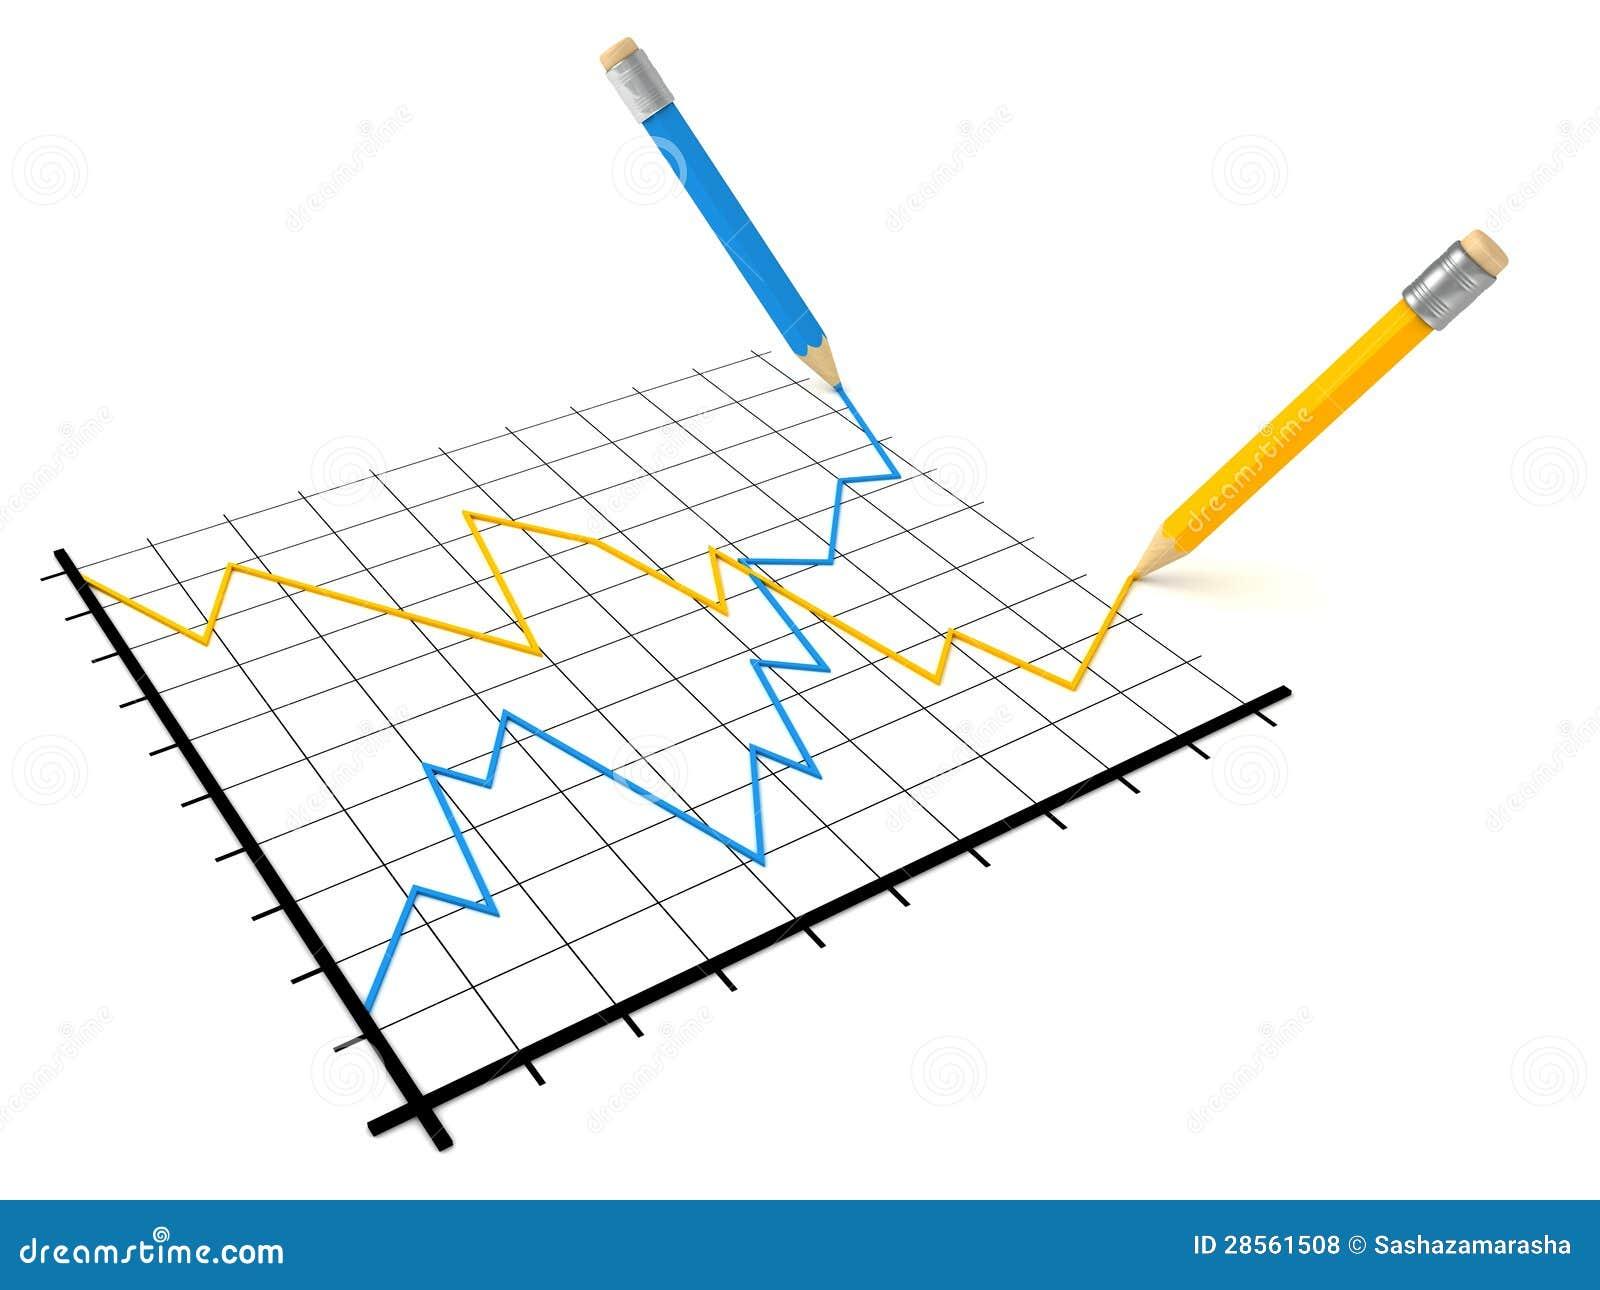 NYSE:X - United States Steel Stock Price, News, & Analysis